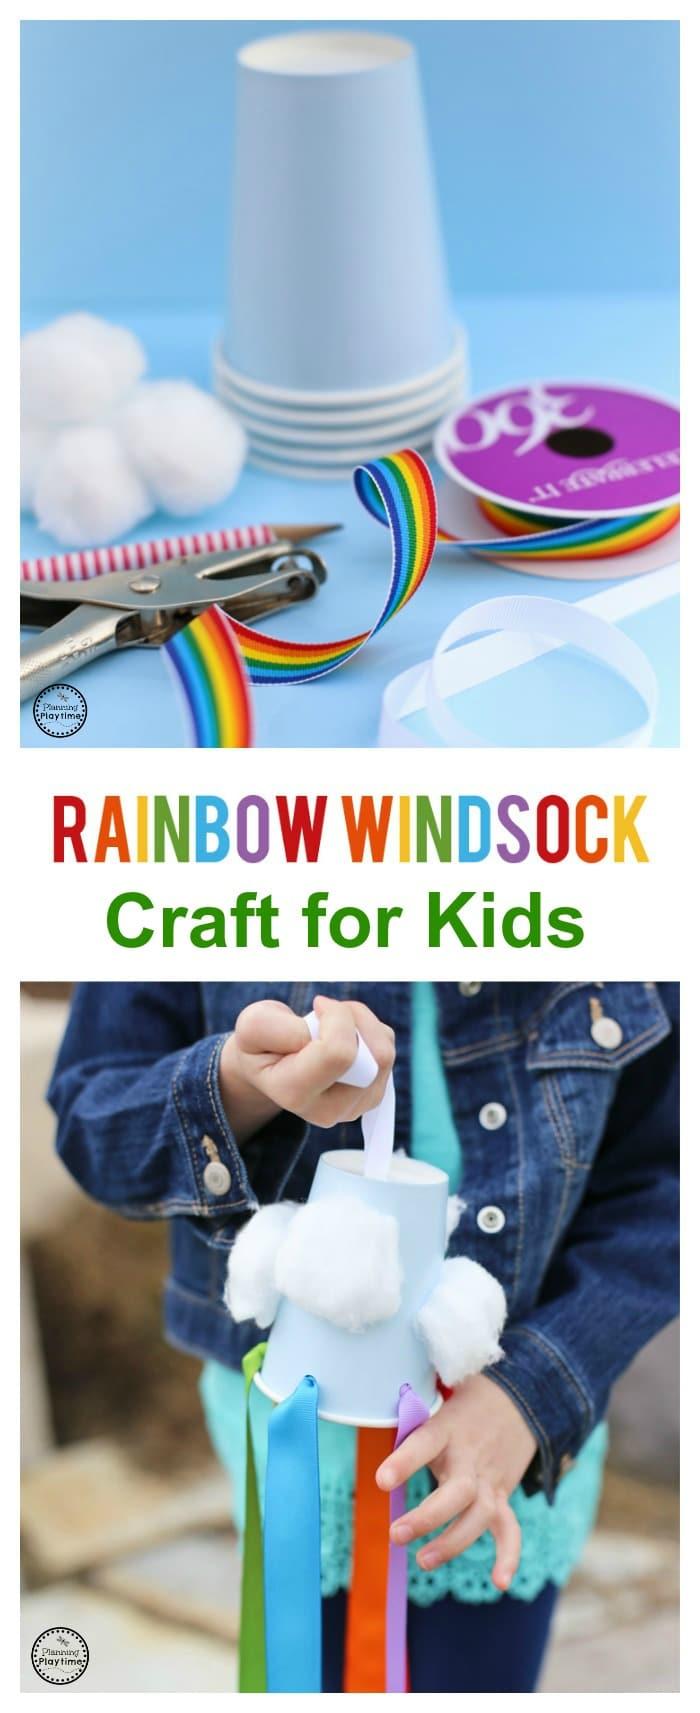 Rainbow Windsock Craft for Kids